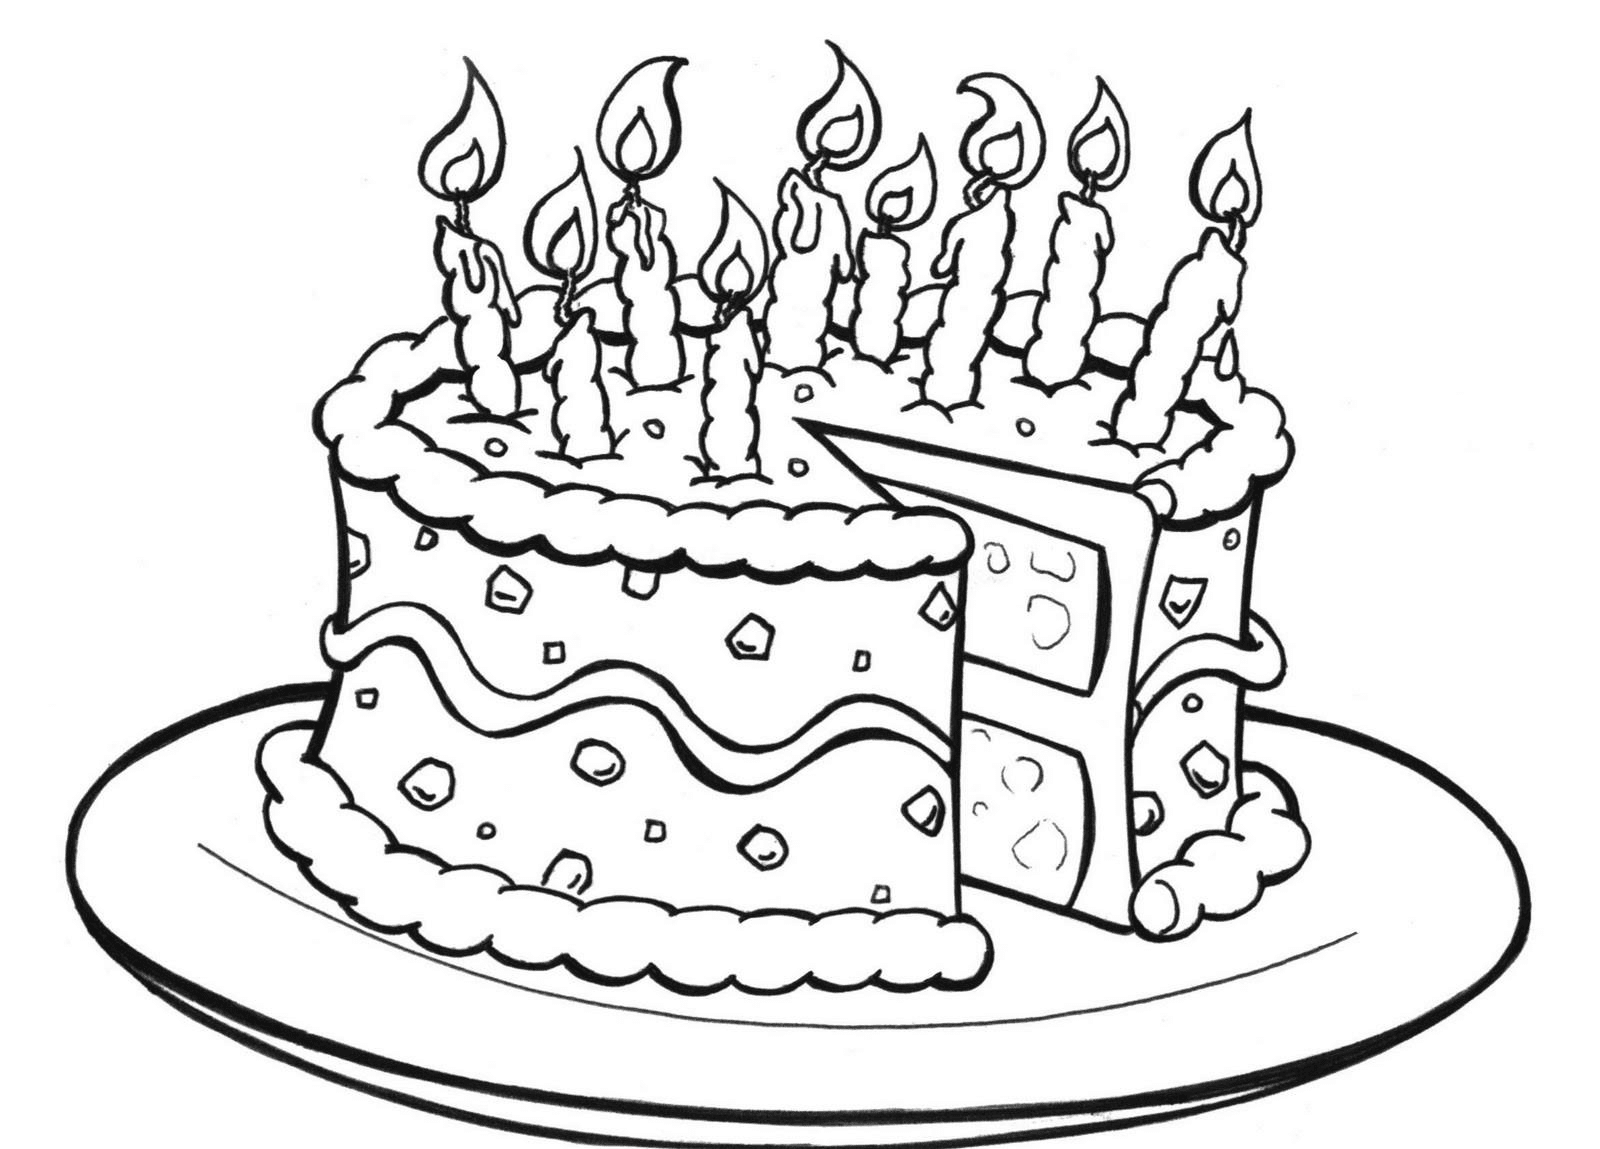 gambar mewarnai kue ulang tahun 1